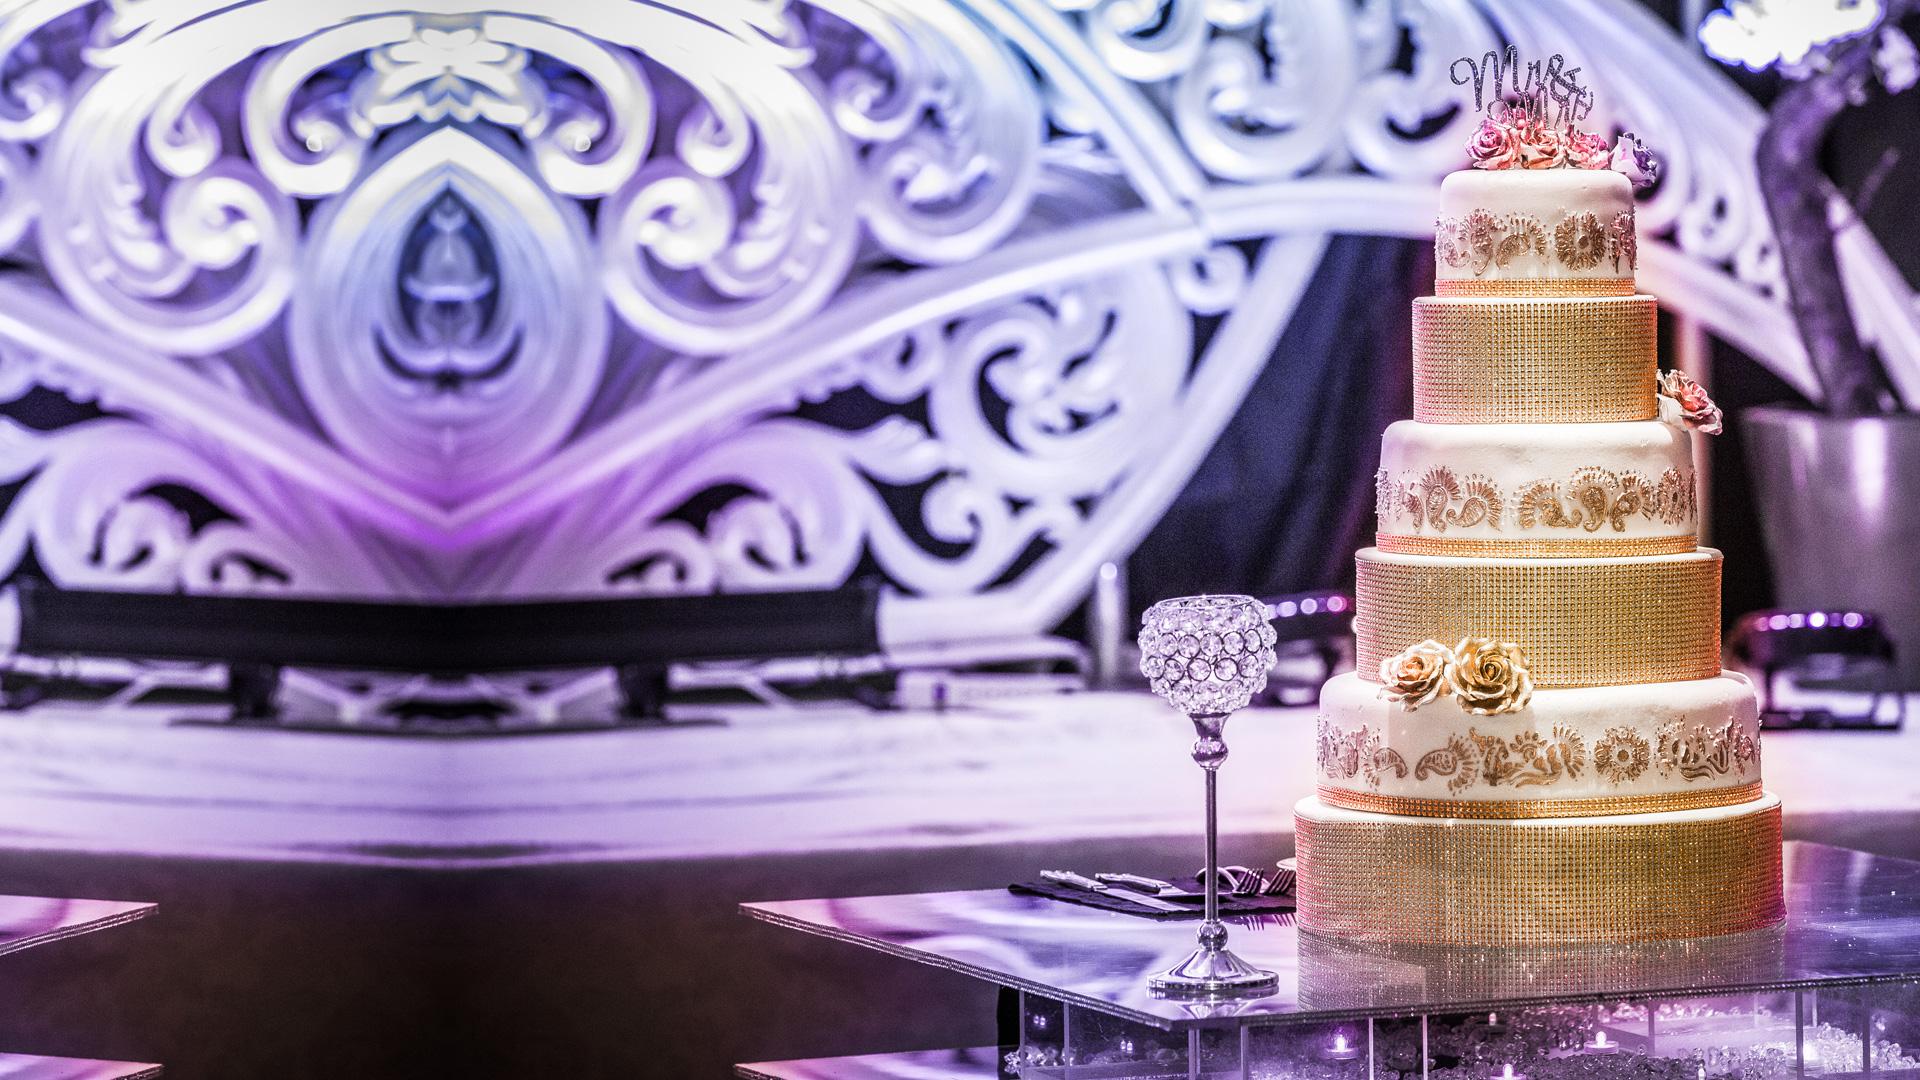 epic_sky_pictures_bridal_bangles_photography_accessories_wedding_weddingday_details_cake_glitter_candid_wedding_5tier_bride_mrandmrs